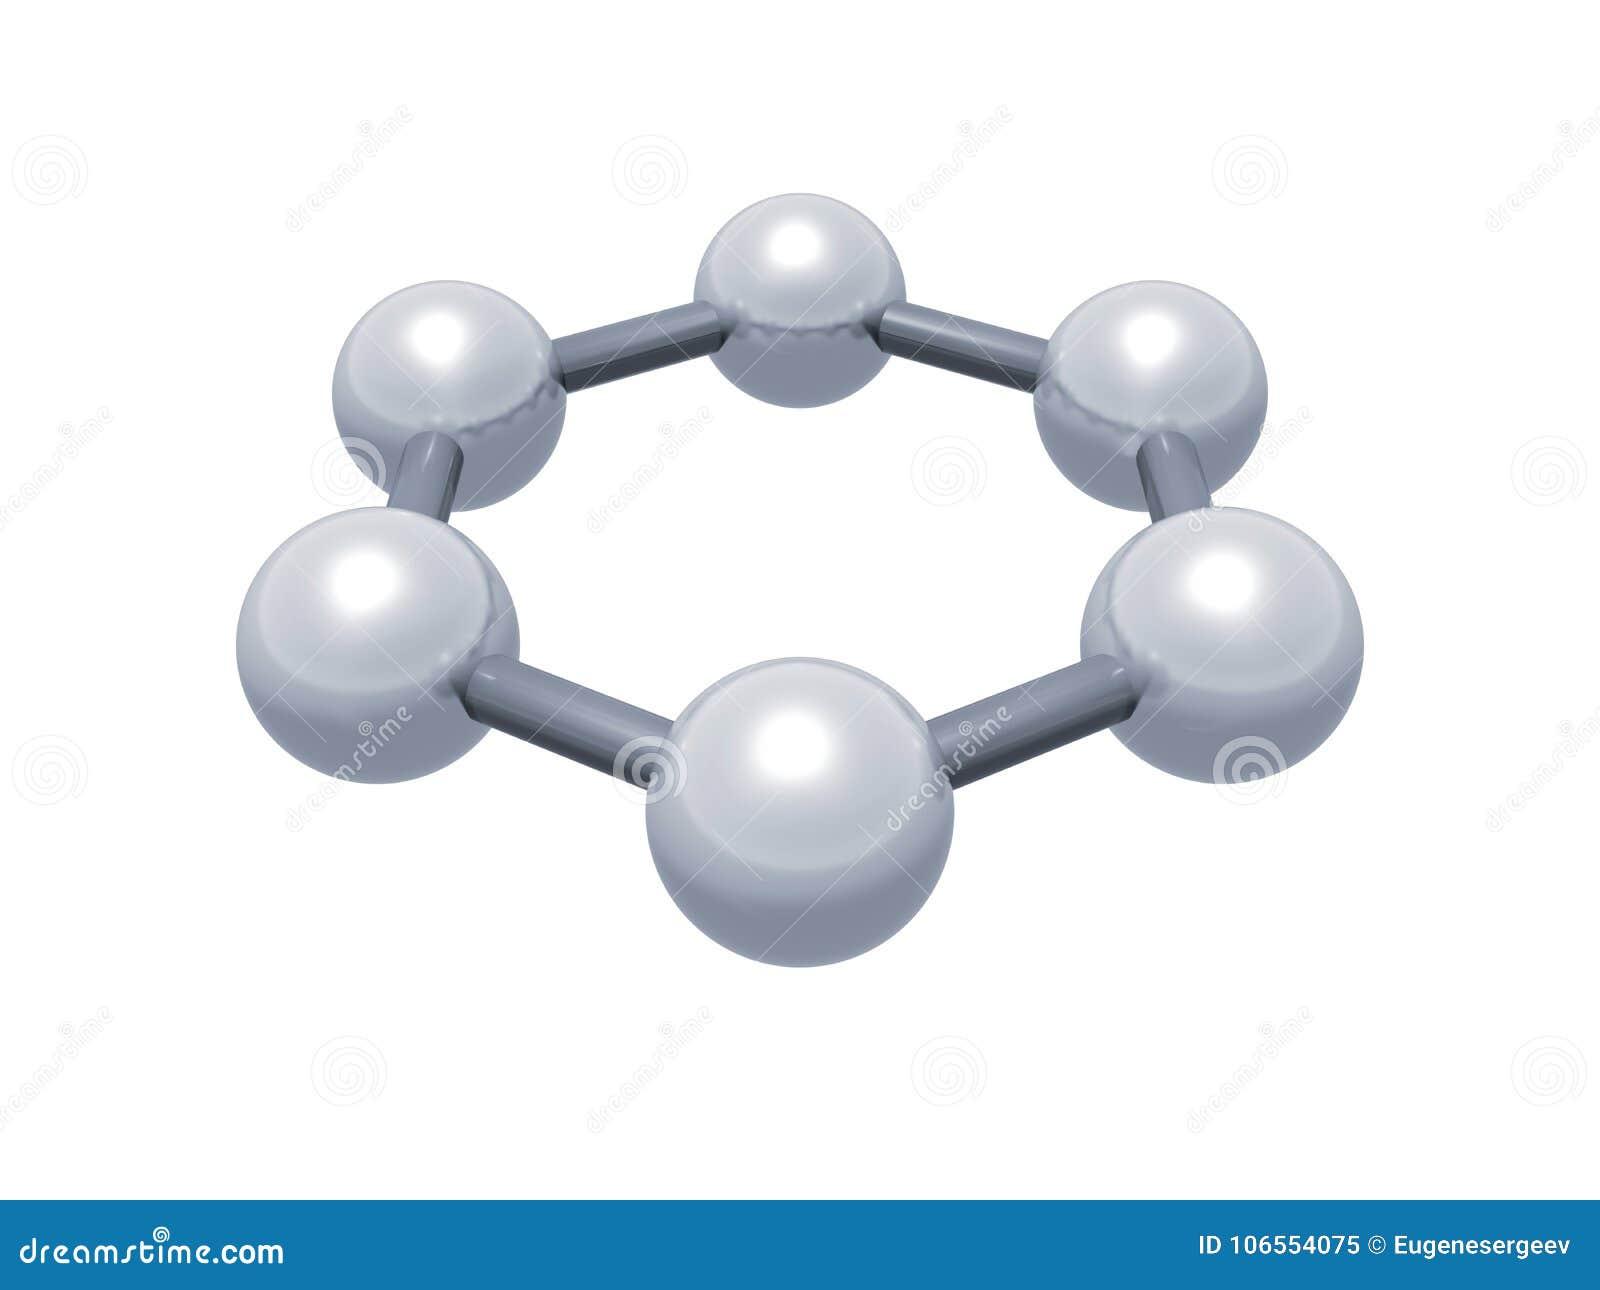 H6 Graphene Aromatic Cluster, Schematic 3d Stock Illustration